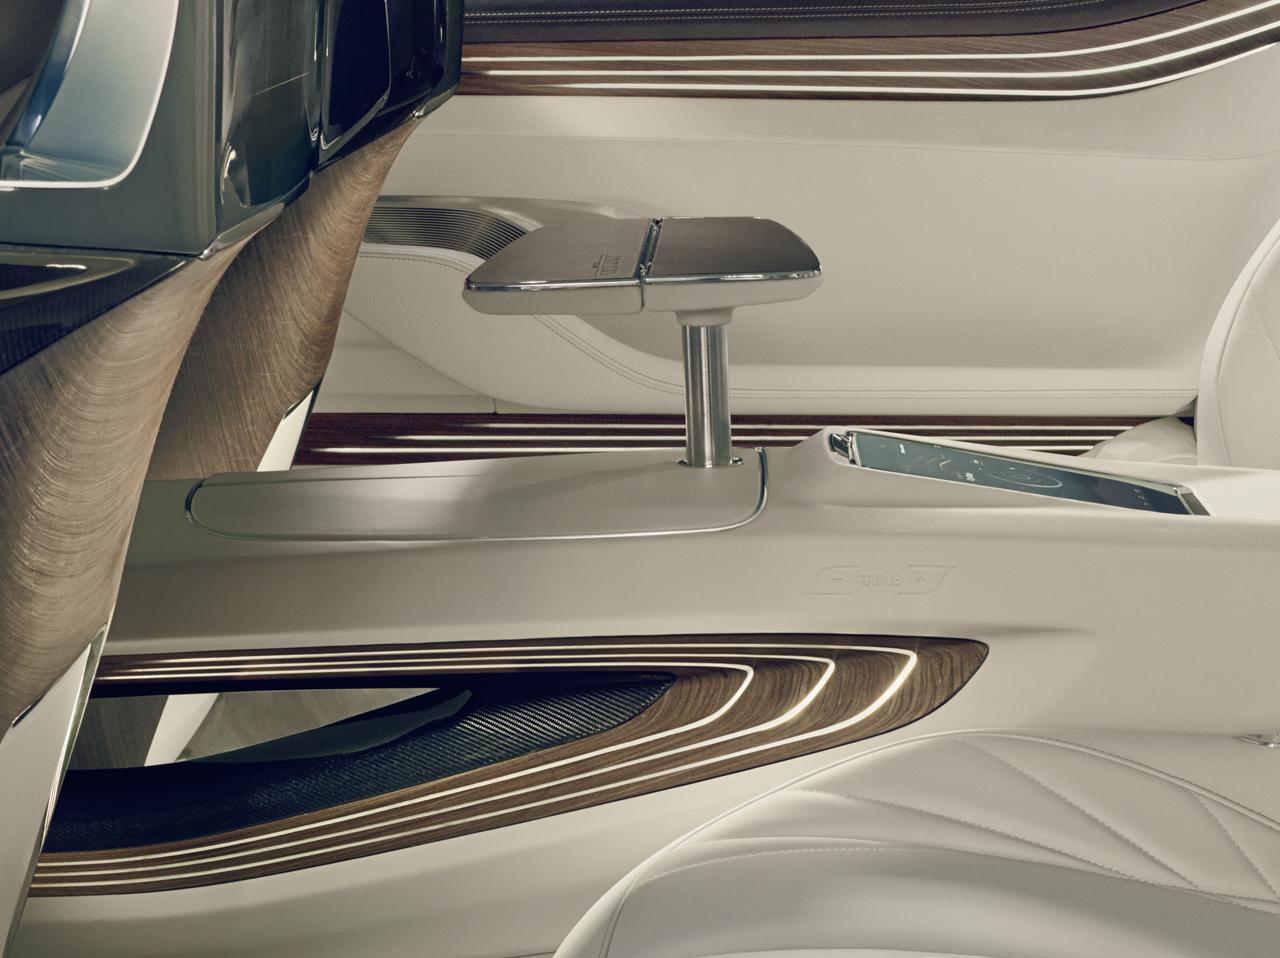 Foto de BMW Vision Future Luxury (38/42)